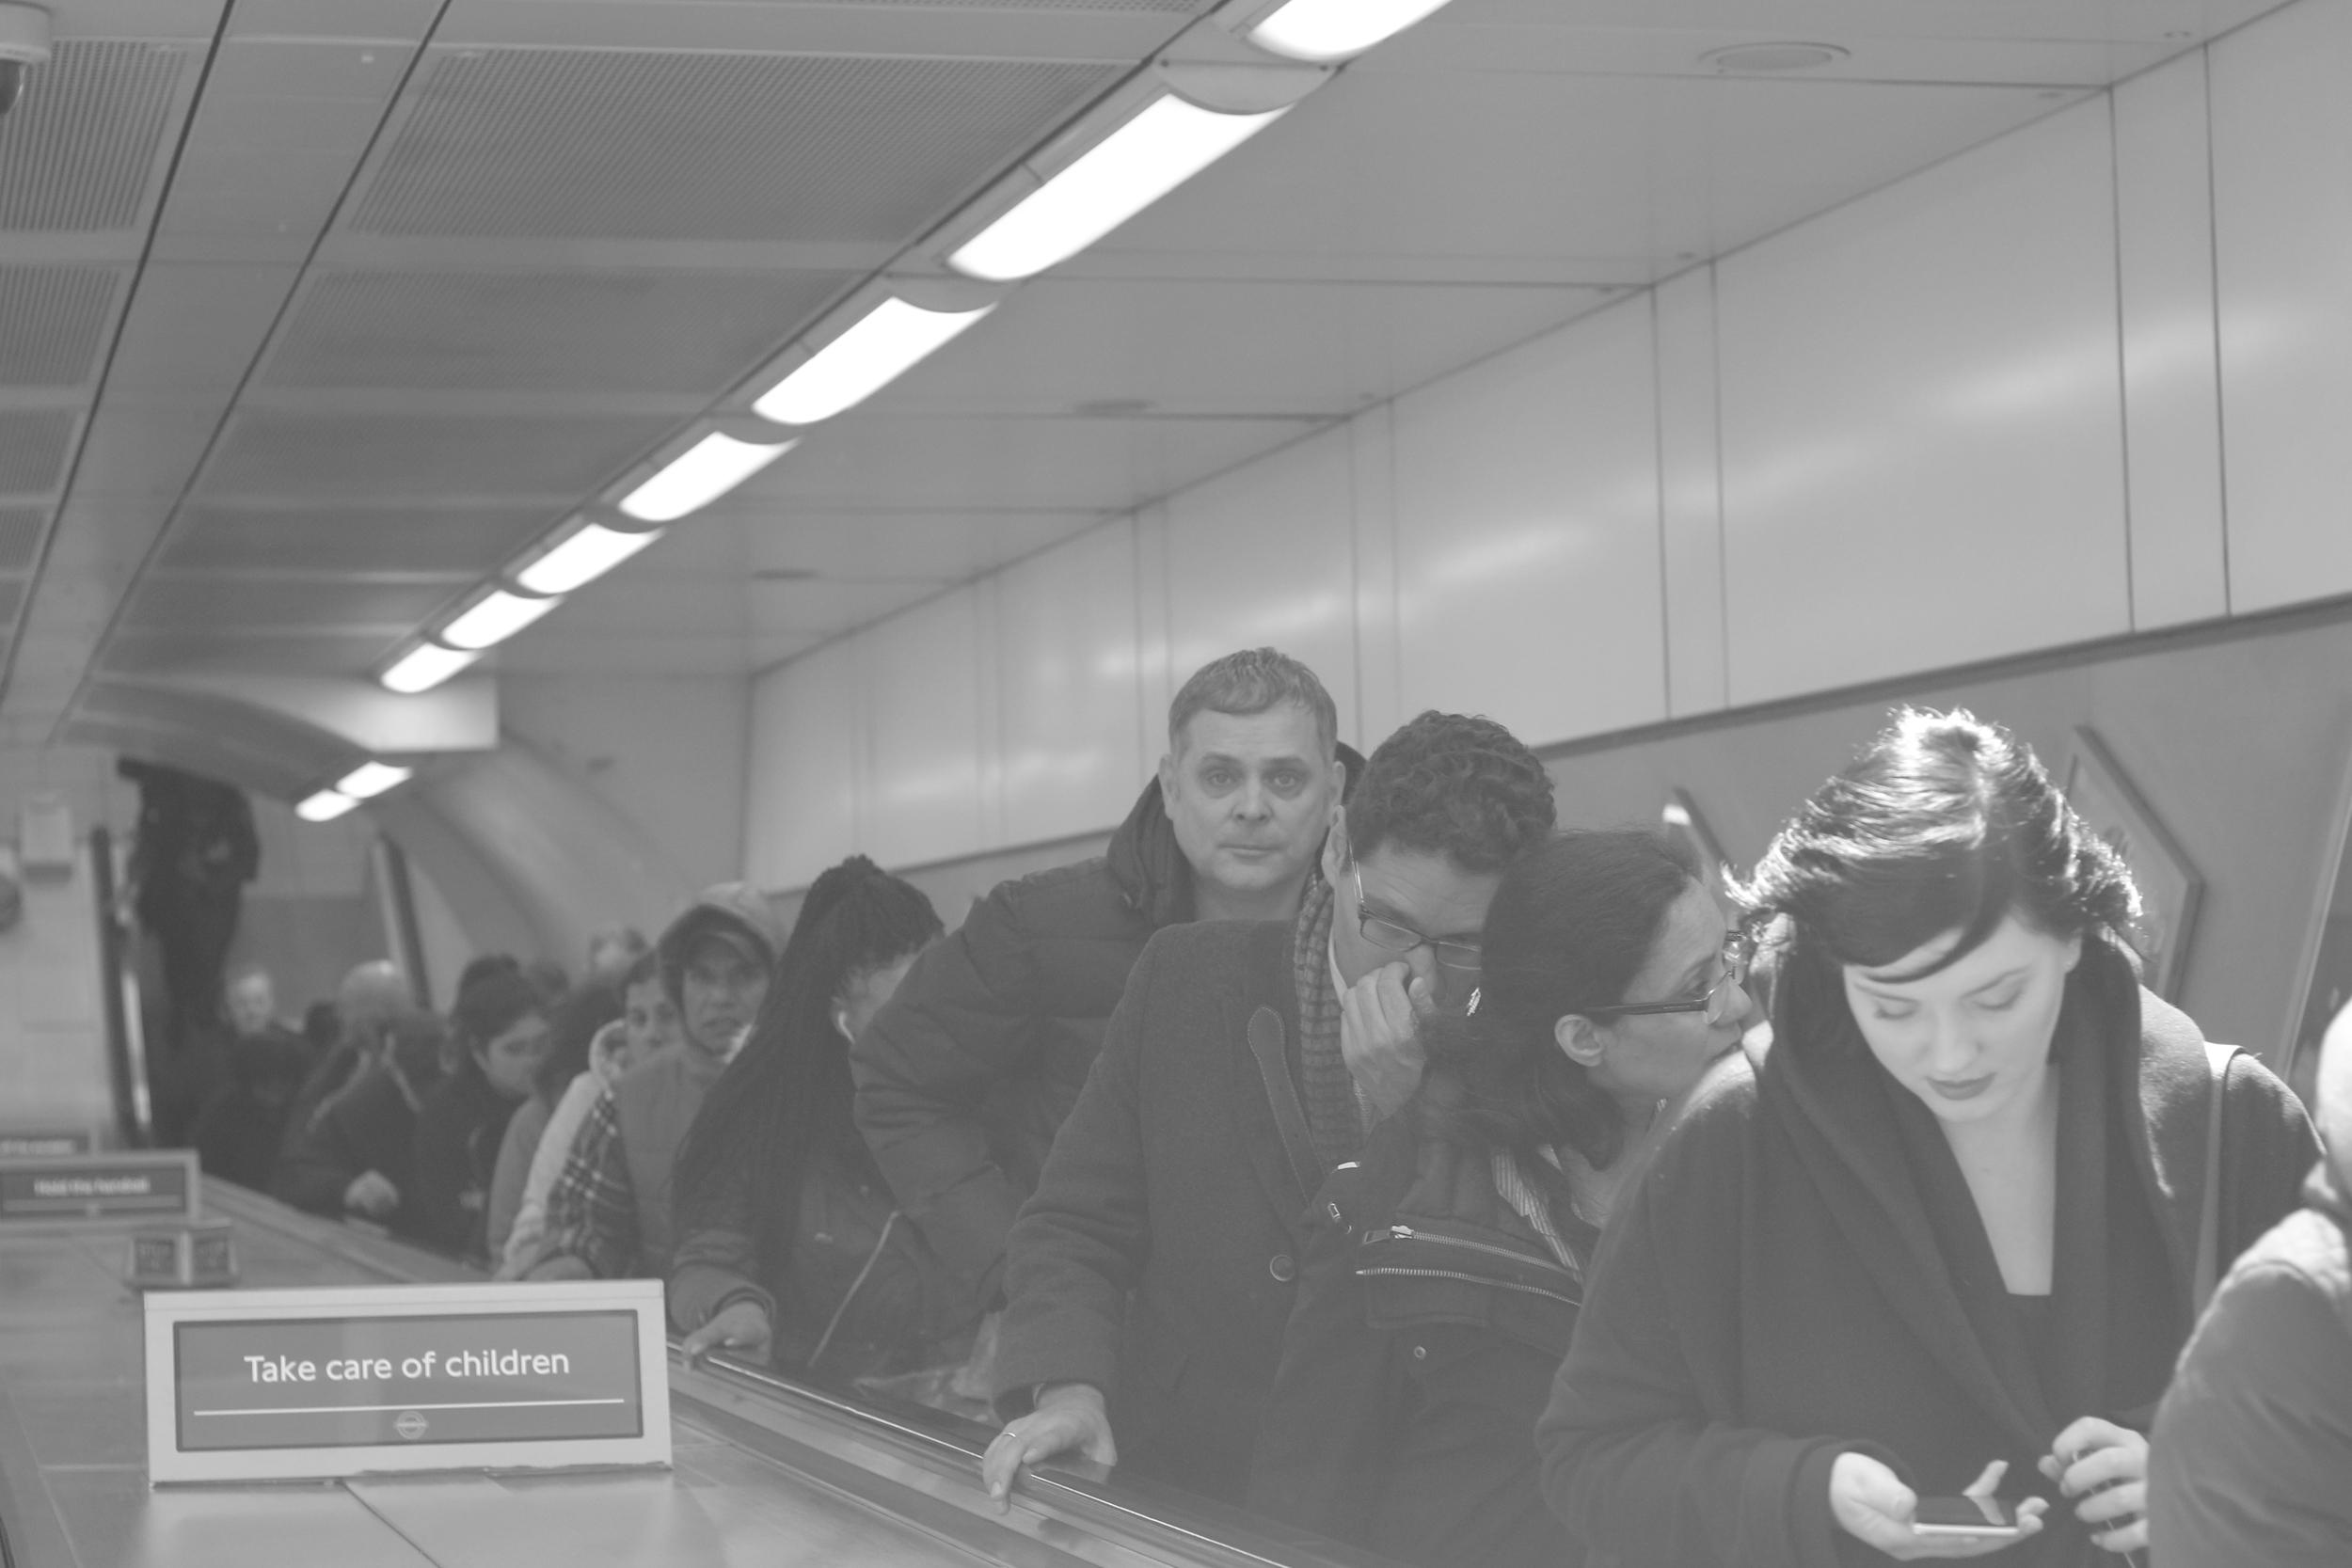 Photo credit: Eleni Philippou, London Underground March'16